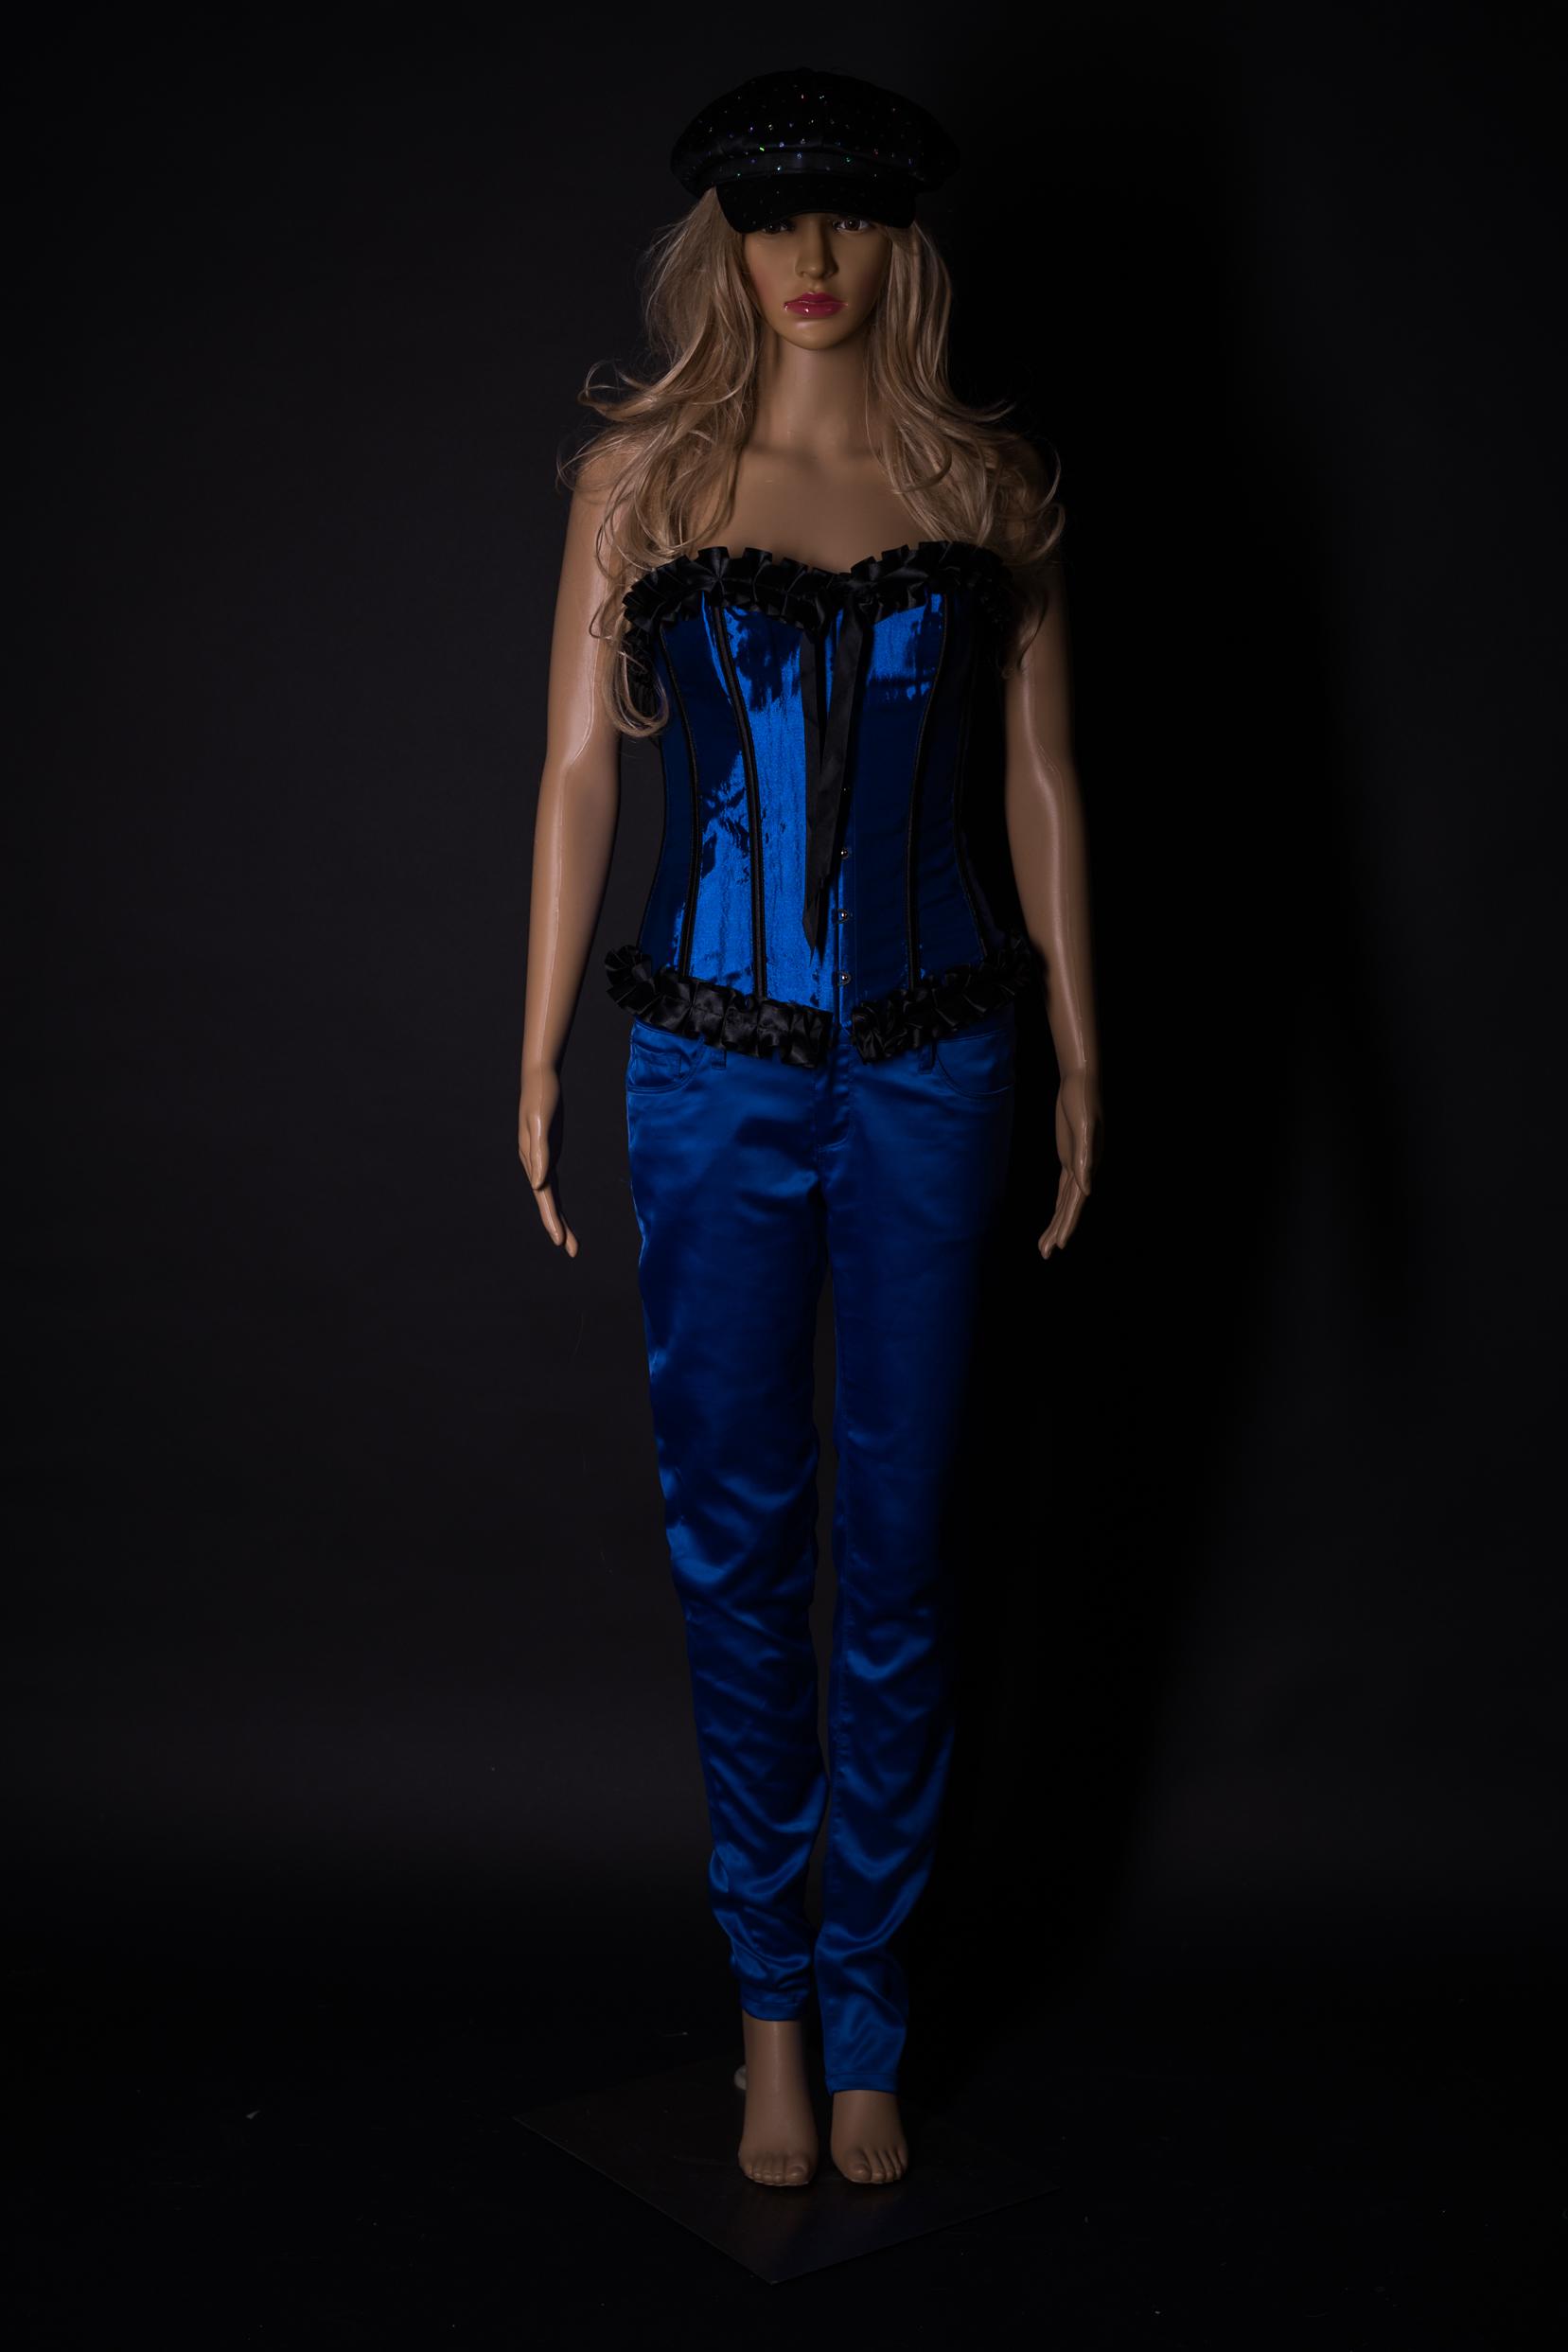 KOrsage Outfit in Royalblau mit pasender Satinhose